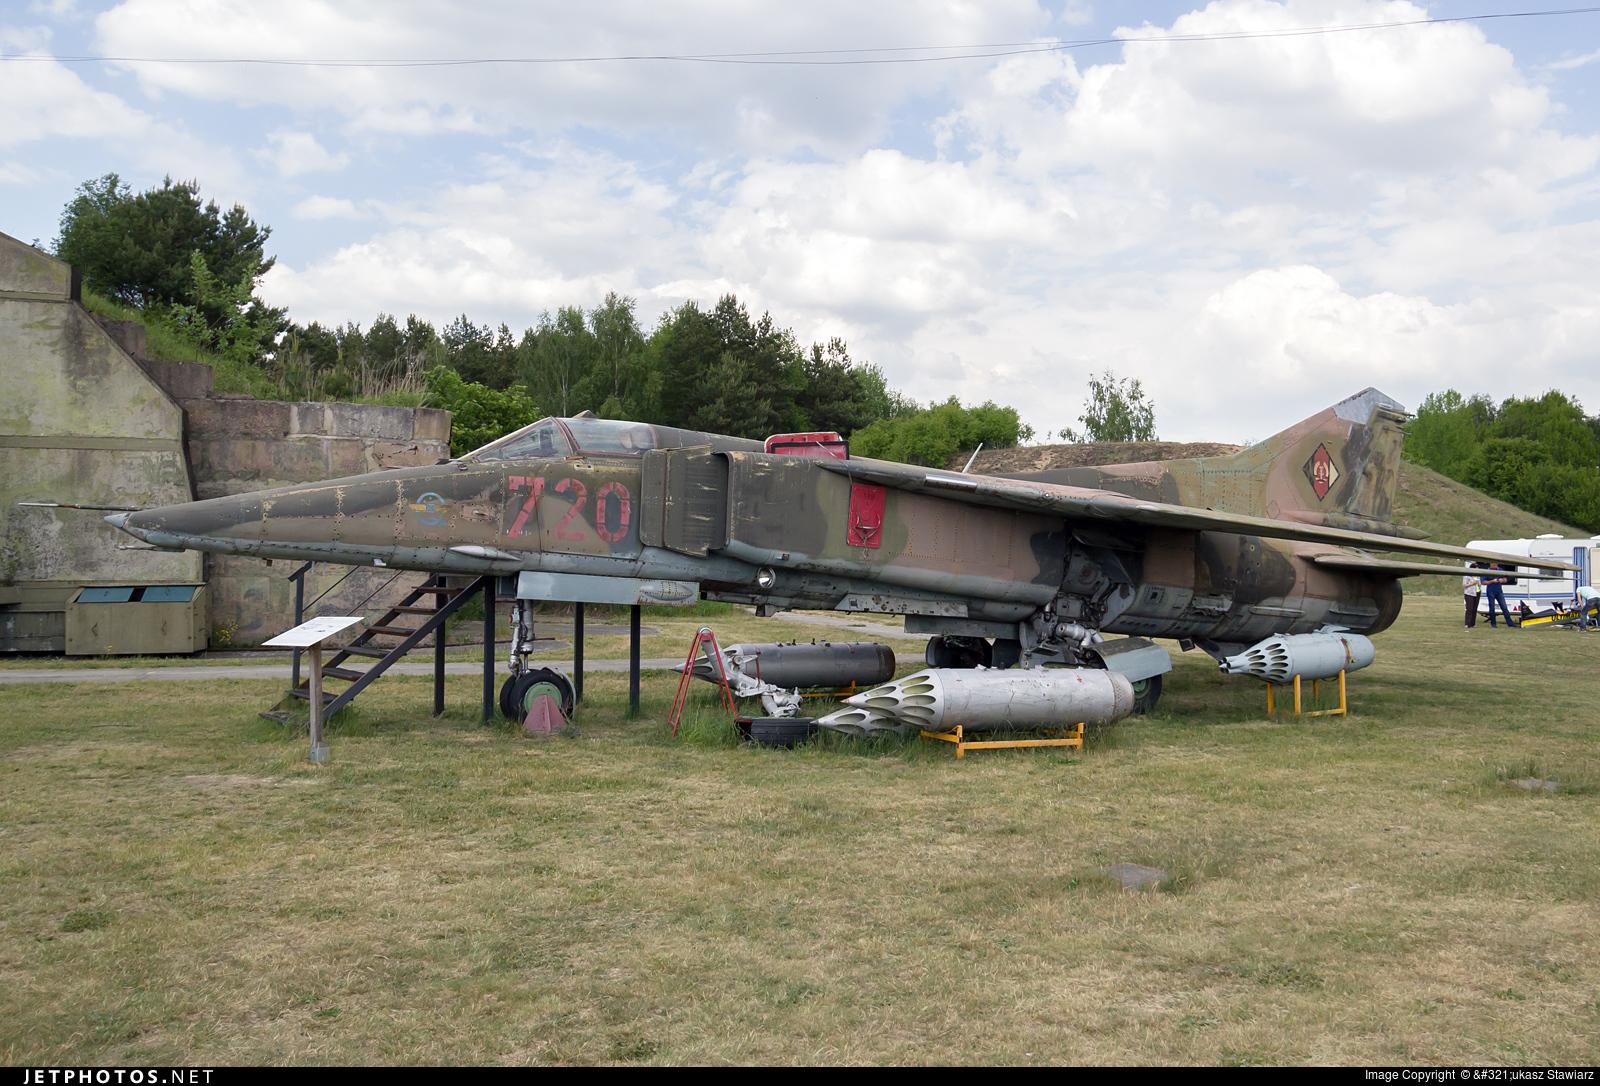 720 - Mikoyan-Gurevich MiG-23BN Flogger H - German Democratic Republic - Air Force